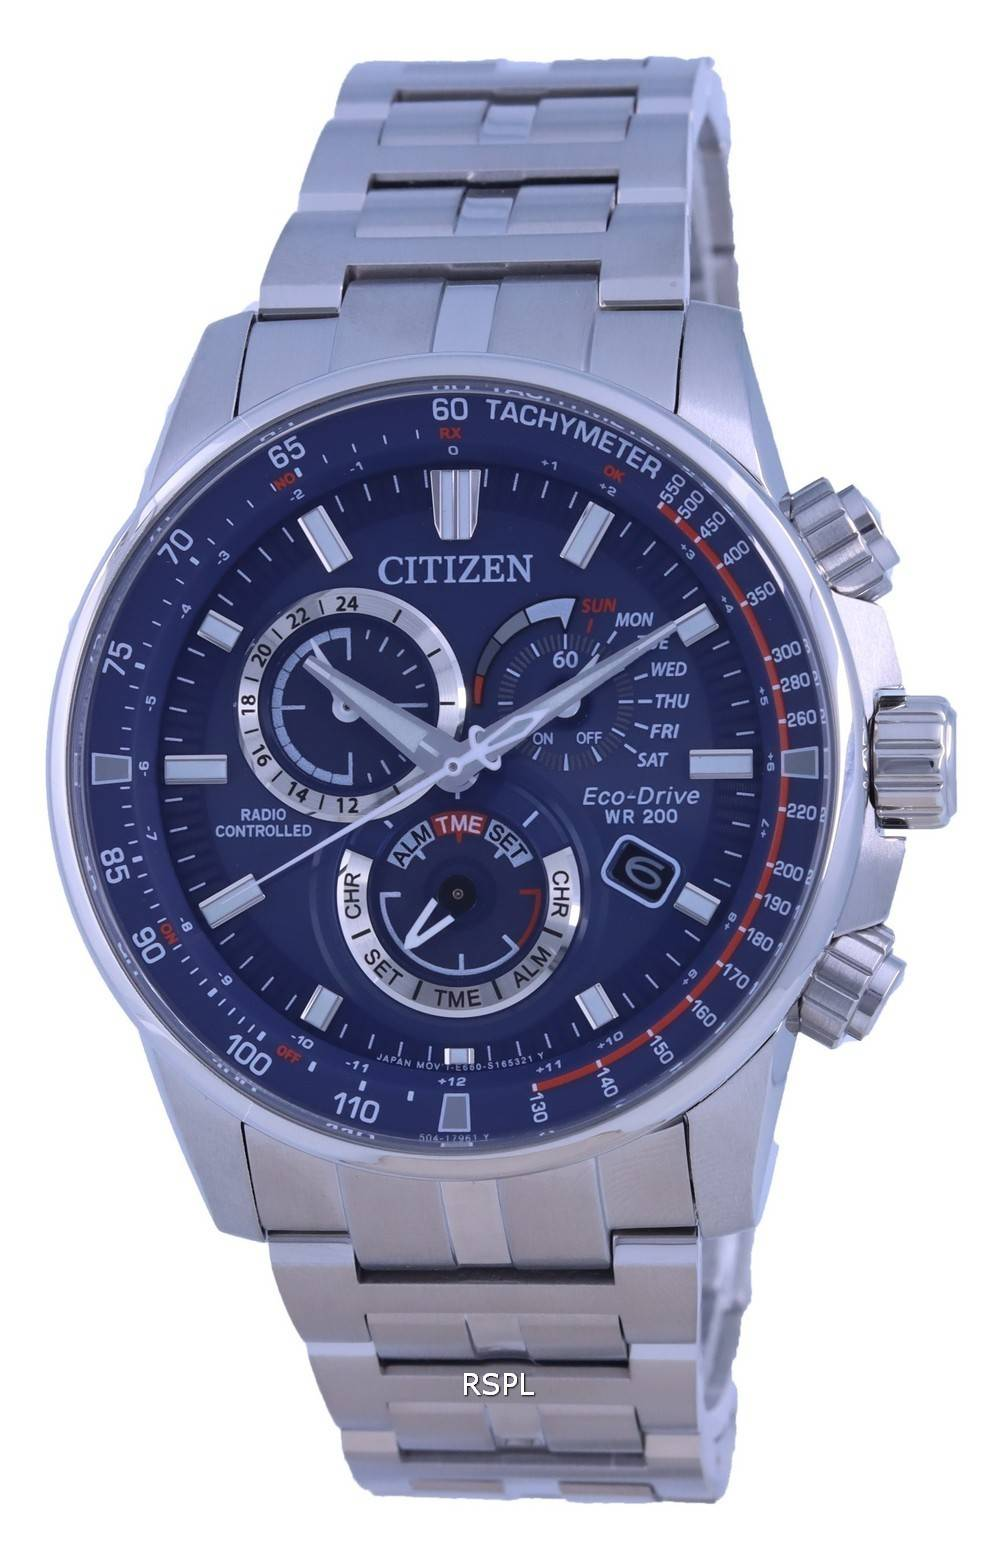 Citizen PCAT Radio Controlled Chronograph Atomic Eco-Drive CB5880-54L 200M Mens Watch